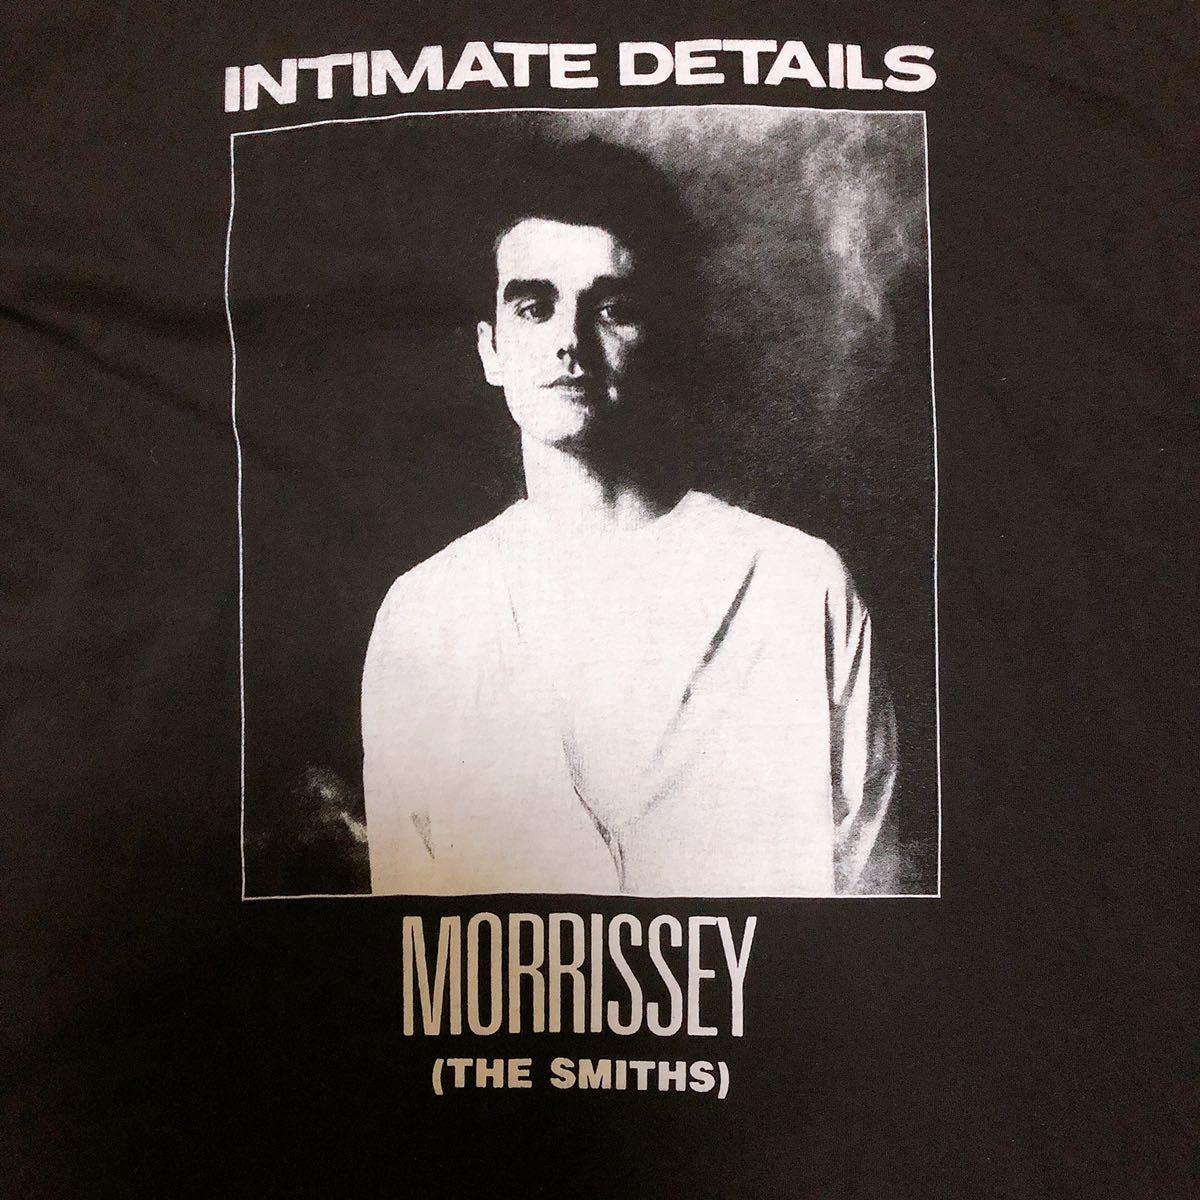 Smiths Morrissey Tシャツ Strangeways NYC Tee Supreme_画像3